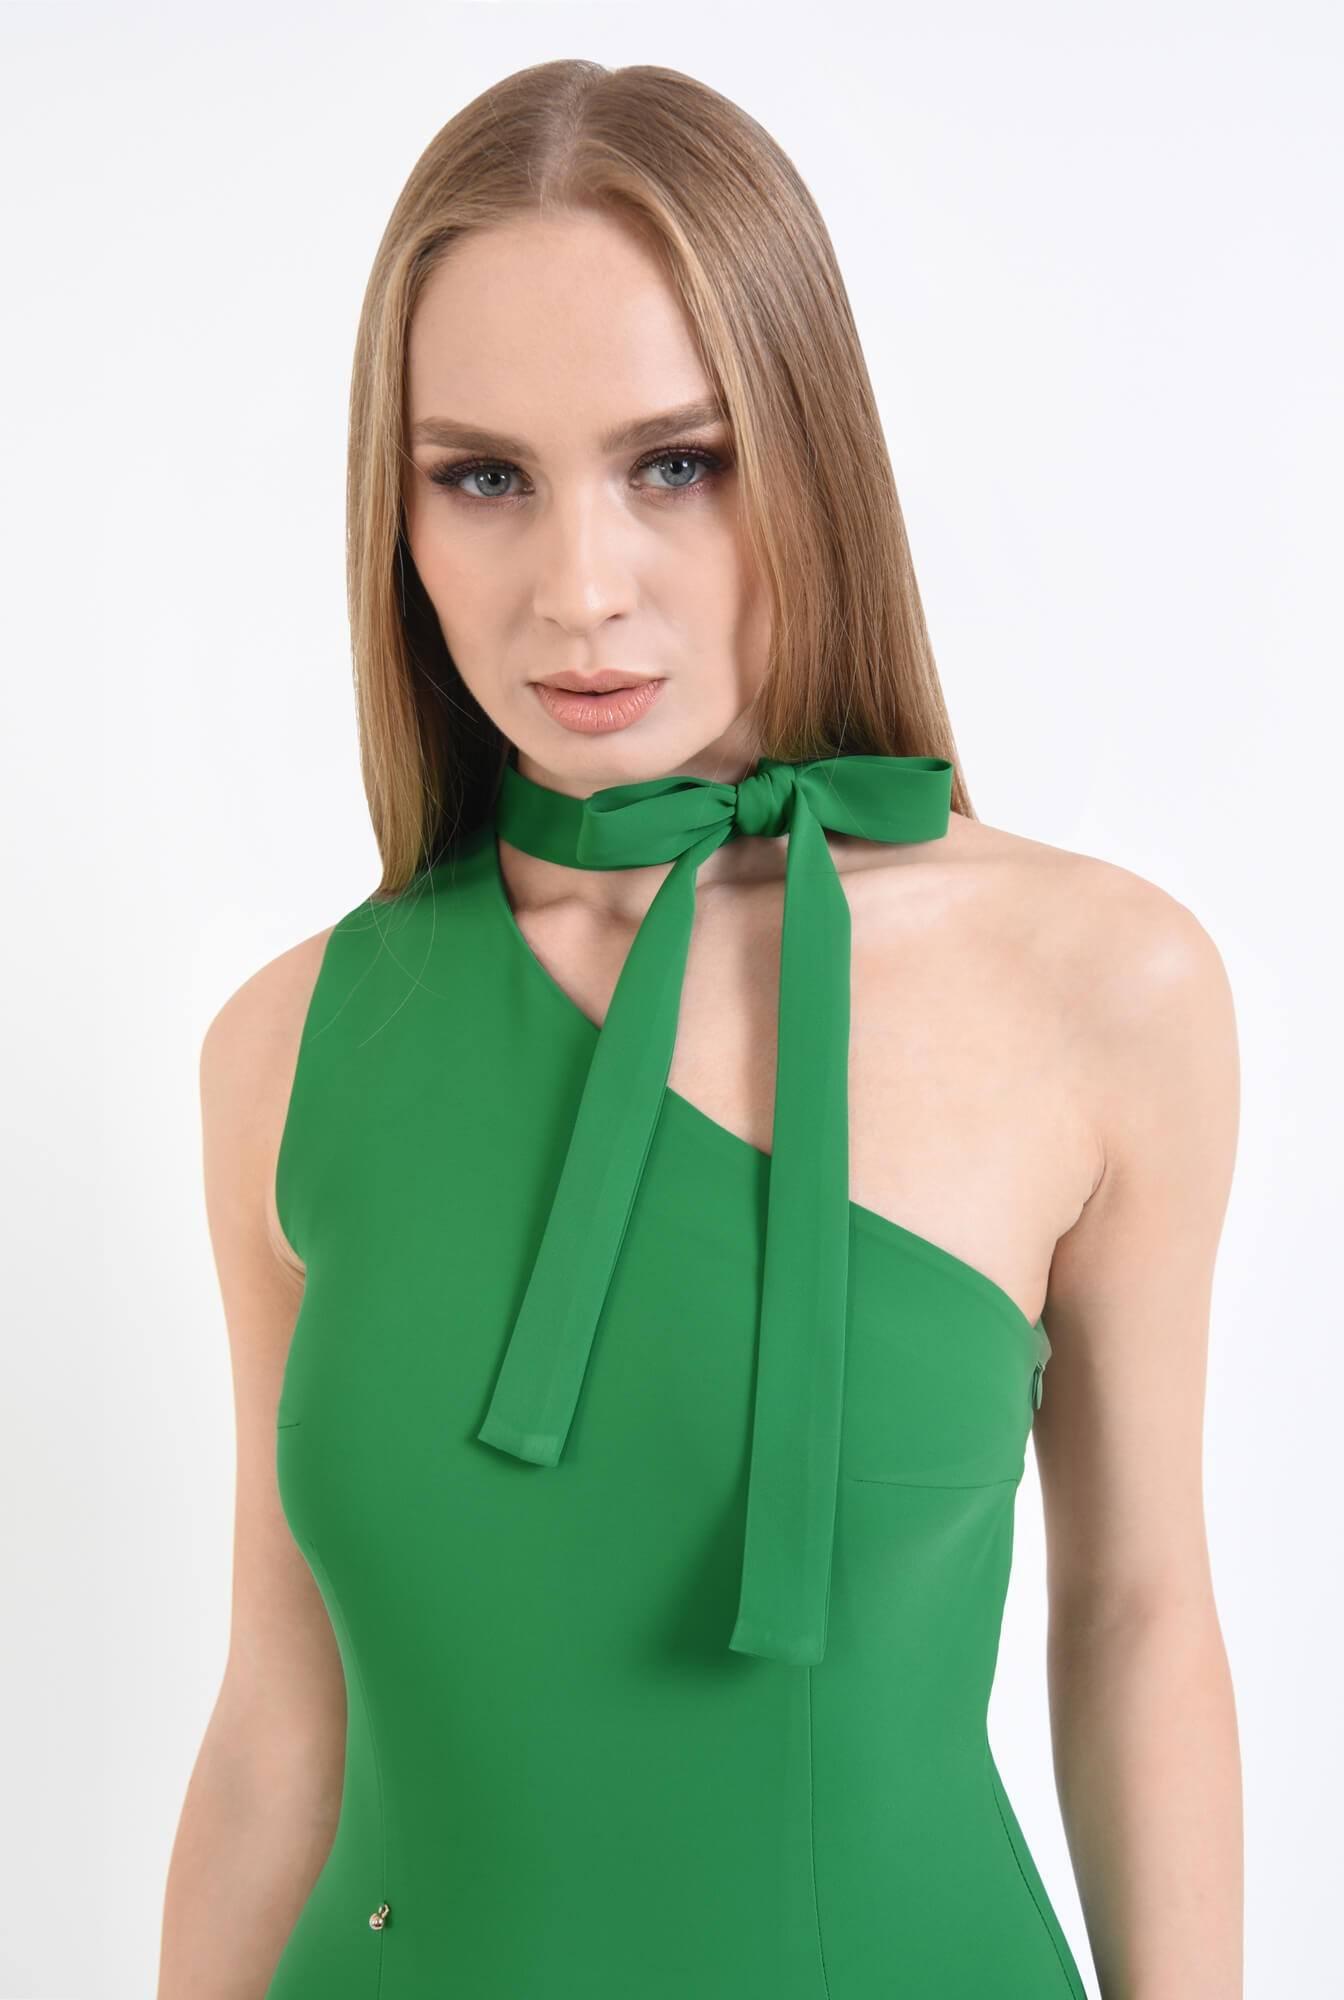 2 - Rochie verde, eleganta, cu umar gol